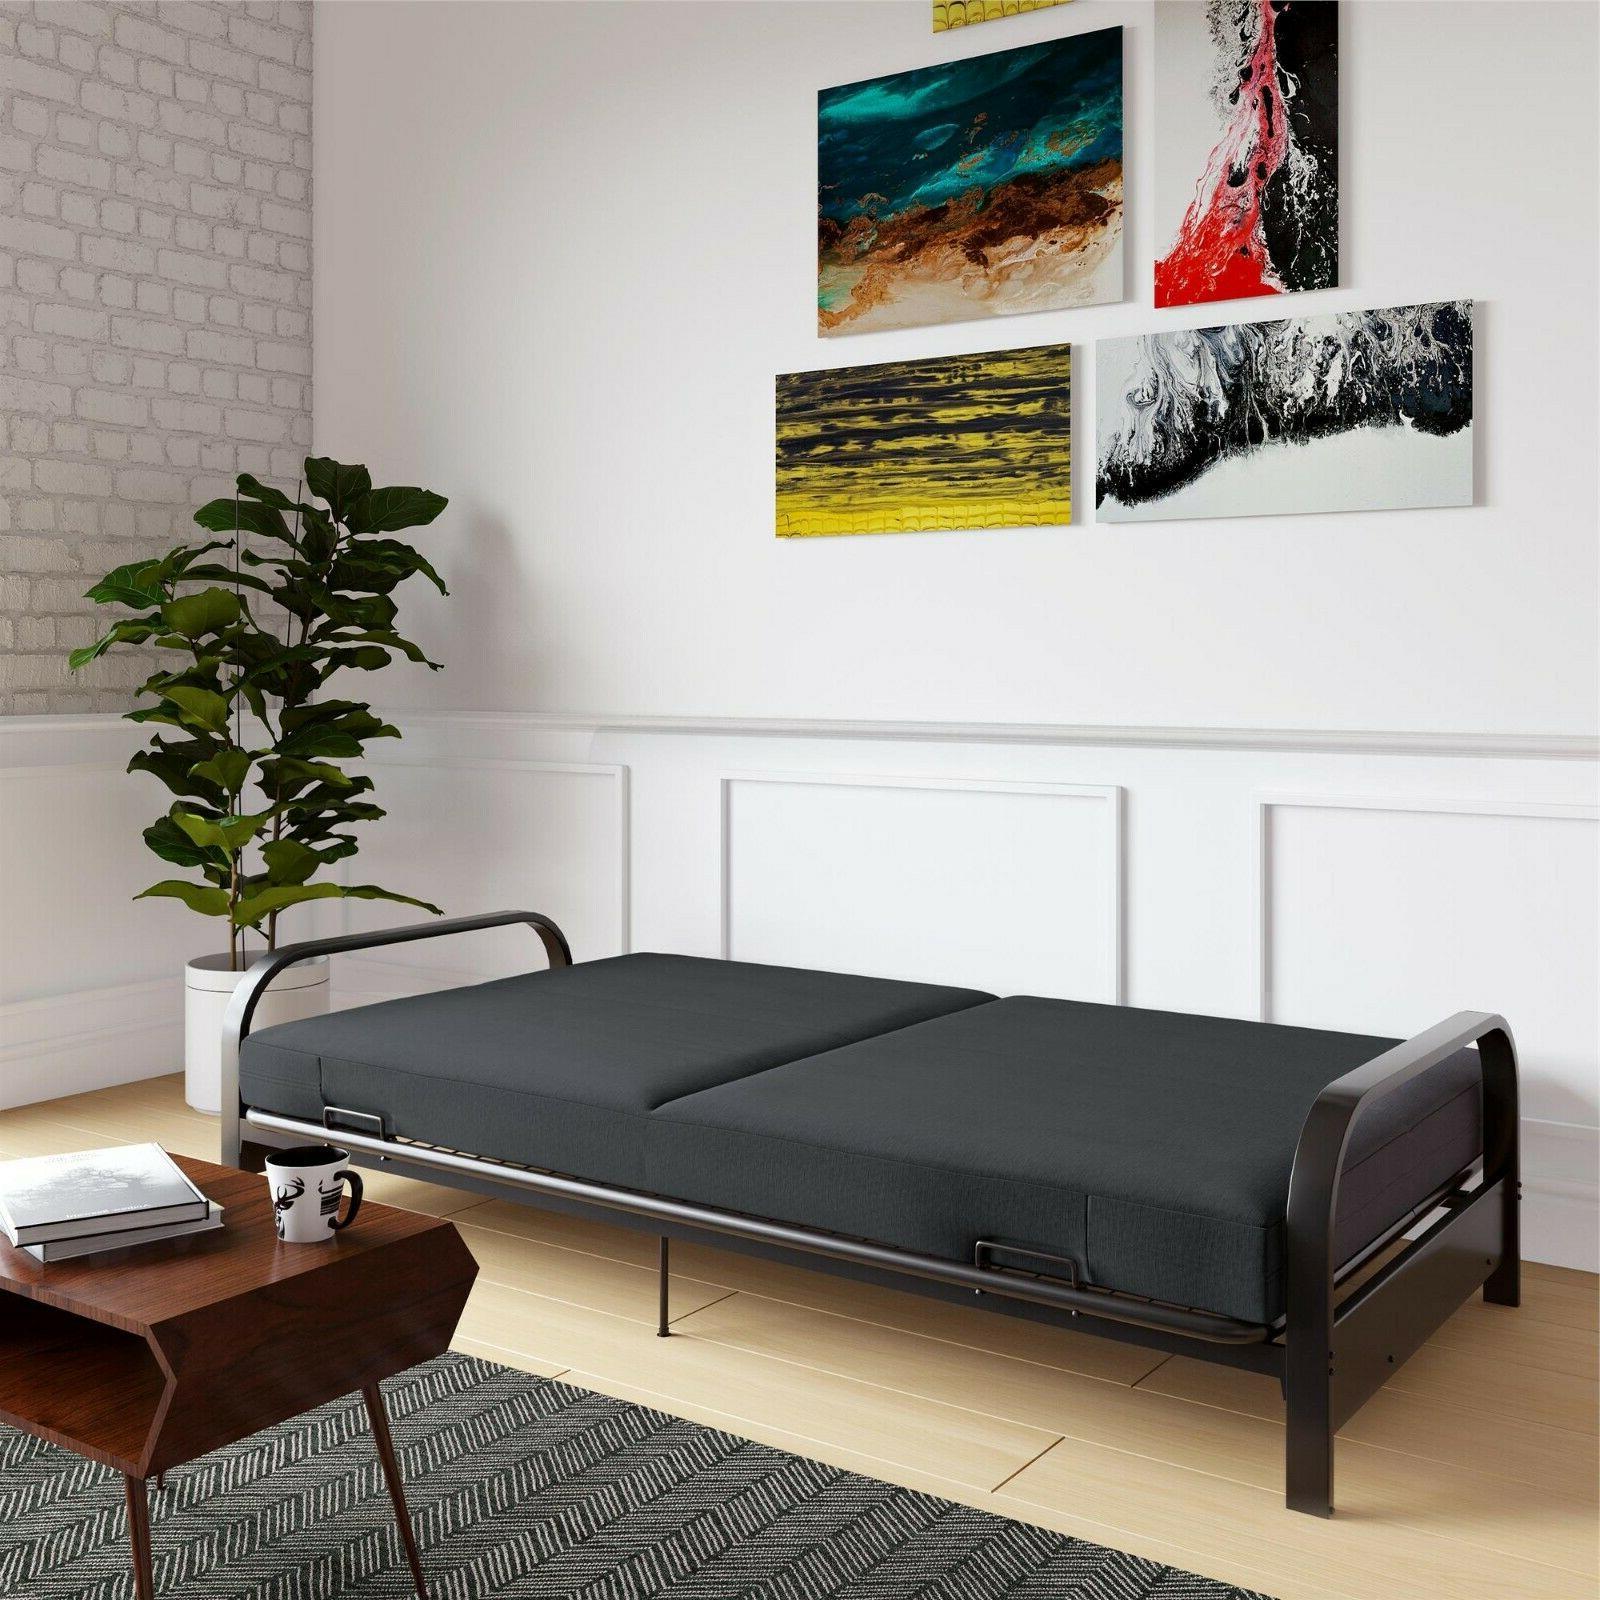 Futon Sleeper Bed Frame Mattress Loveseat Size